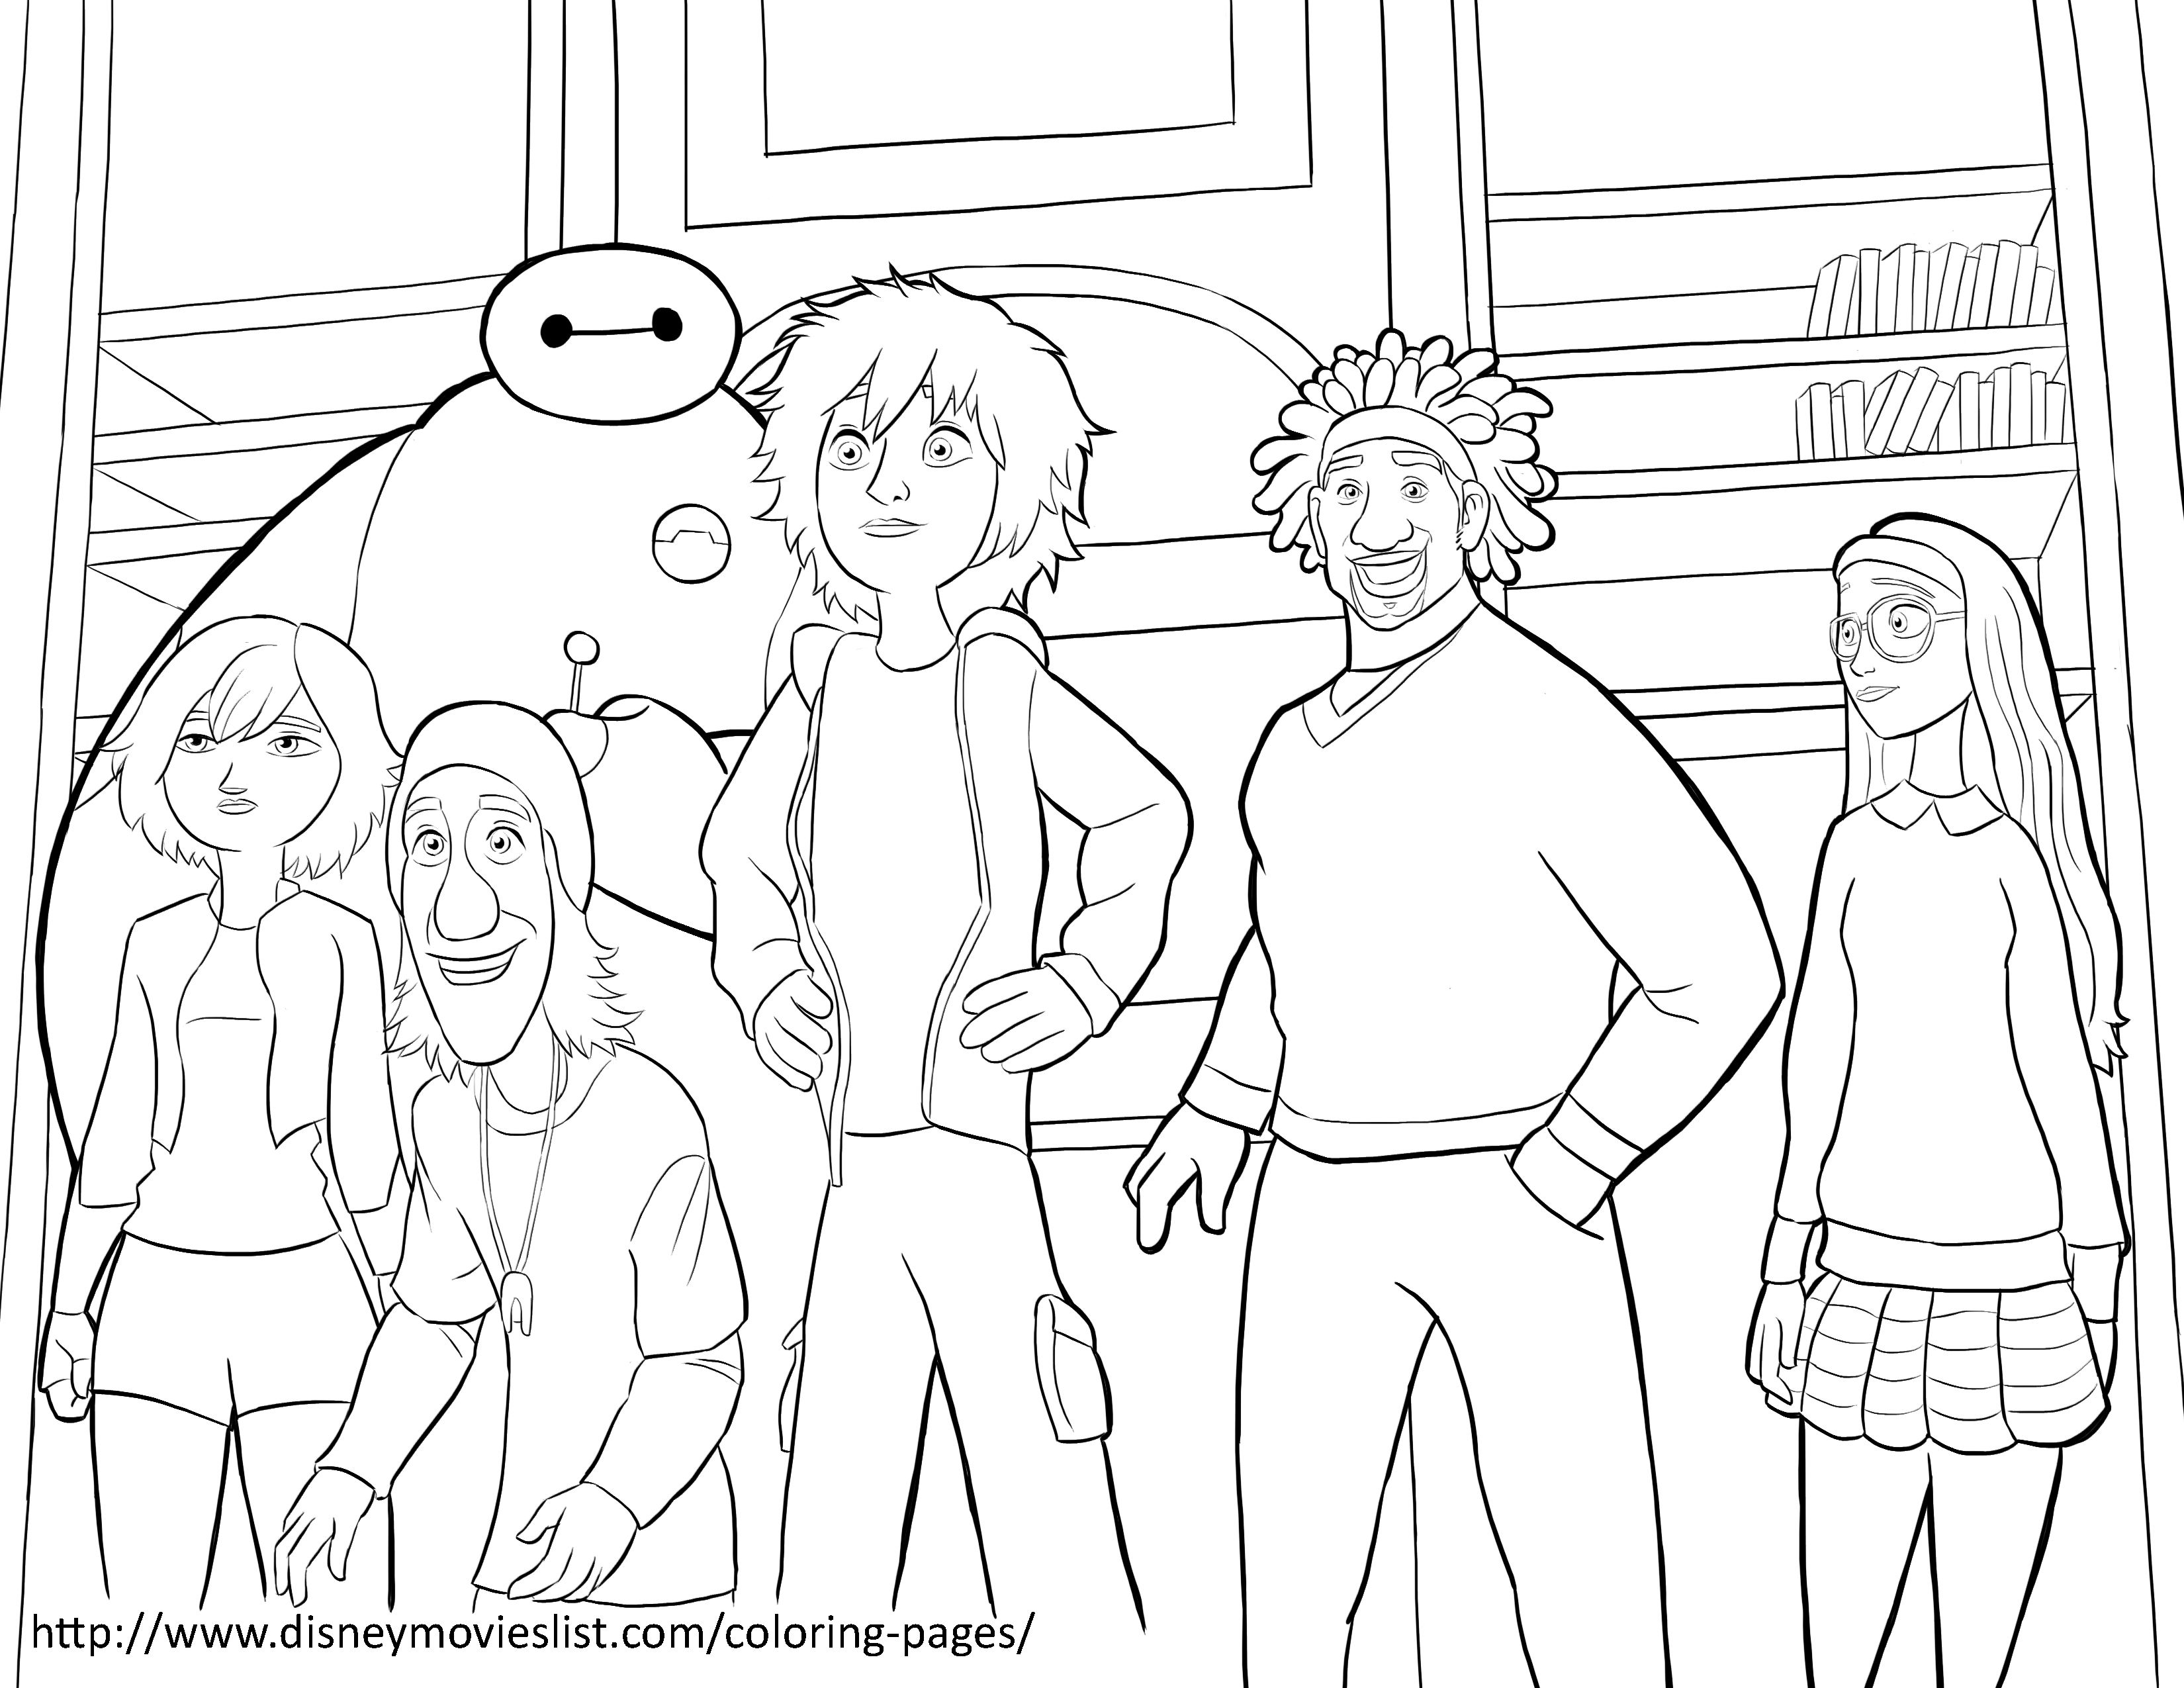 Big Hero 6 Team Coloring Page Sheet Printable Coloring Pages Big Hero Big Hero 6